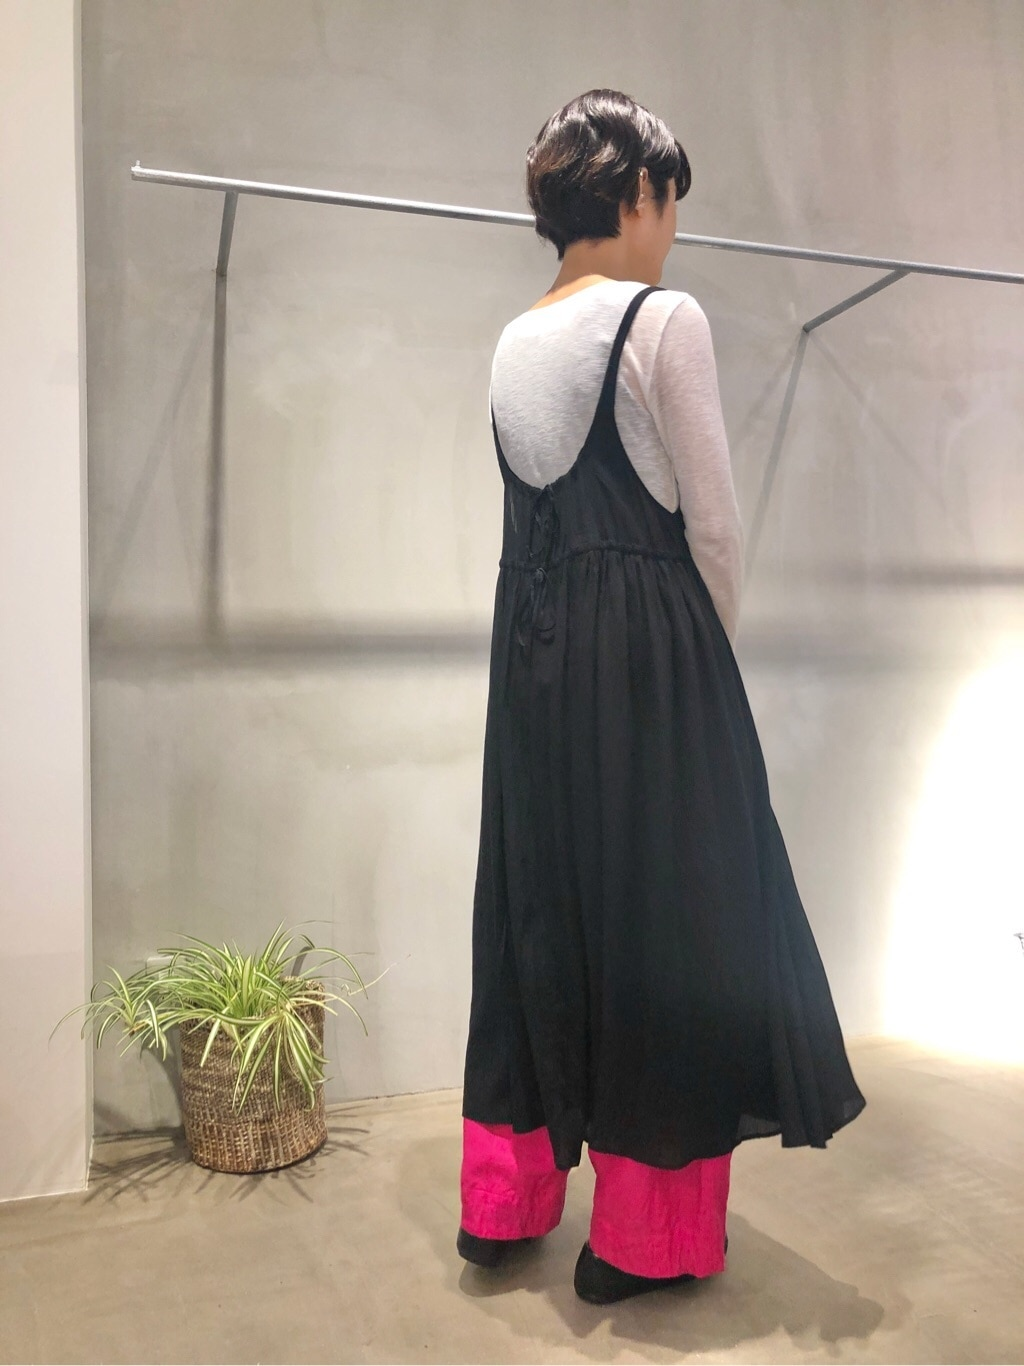 yuni / bulle de savon 京都路面 身長:159cm 2020.07.13